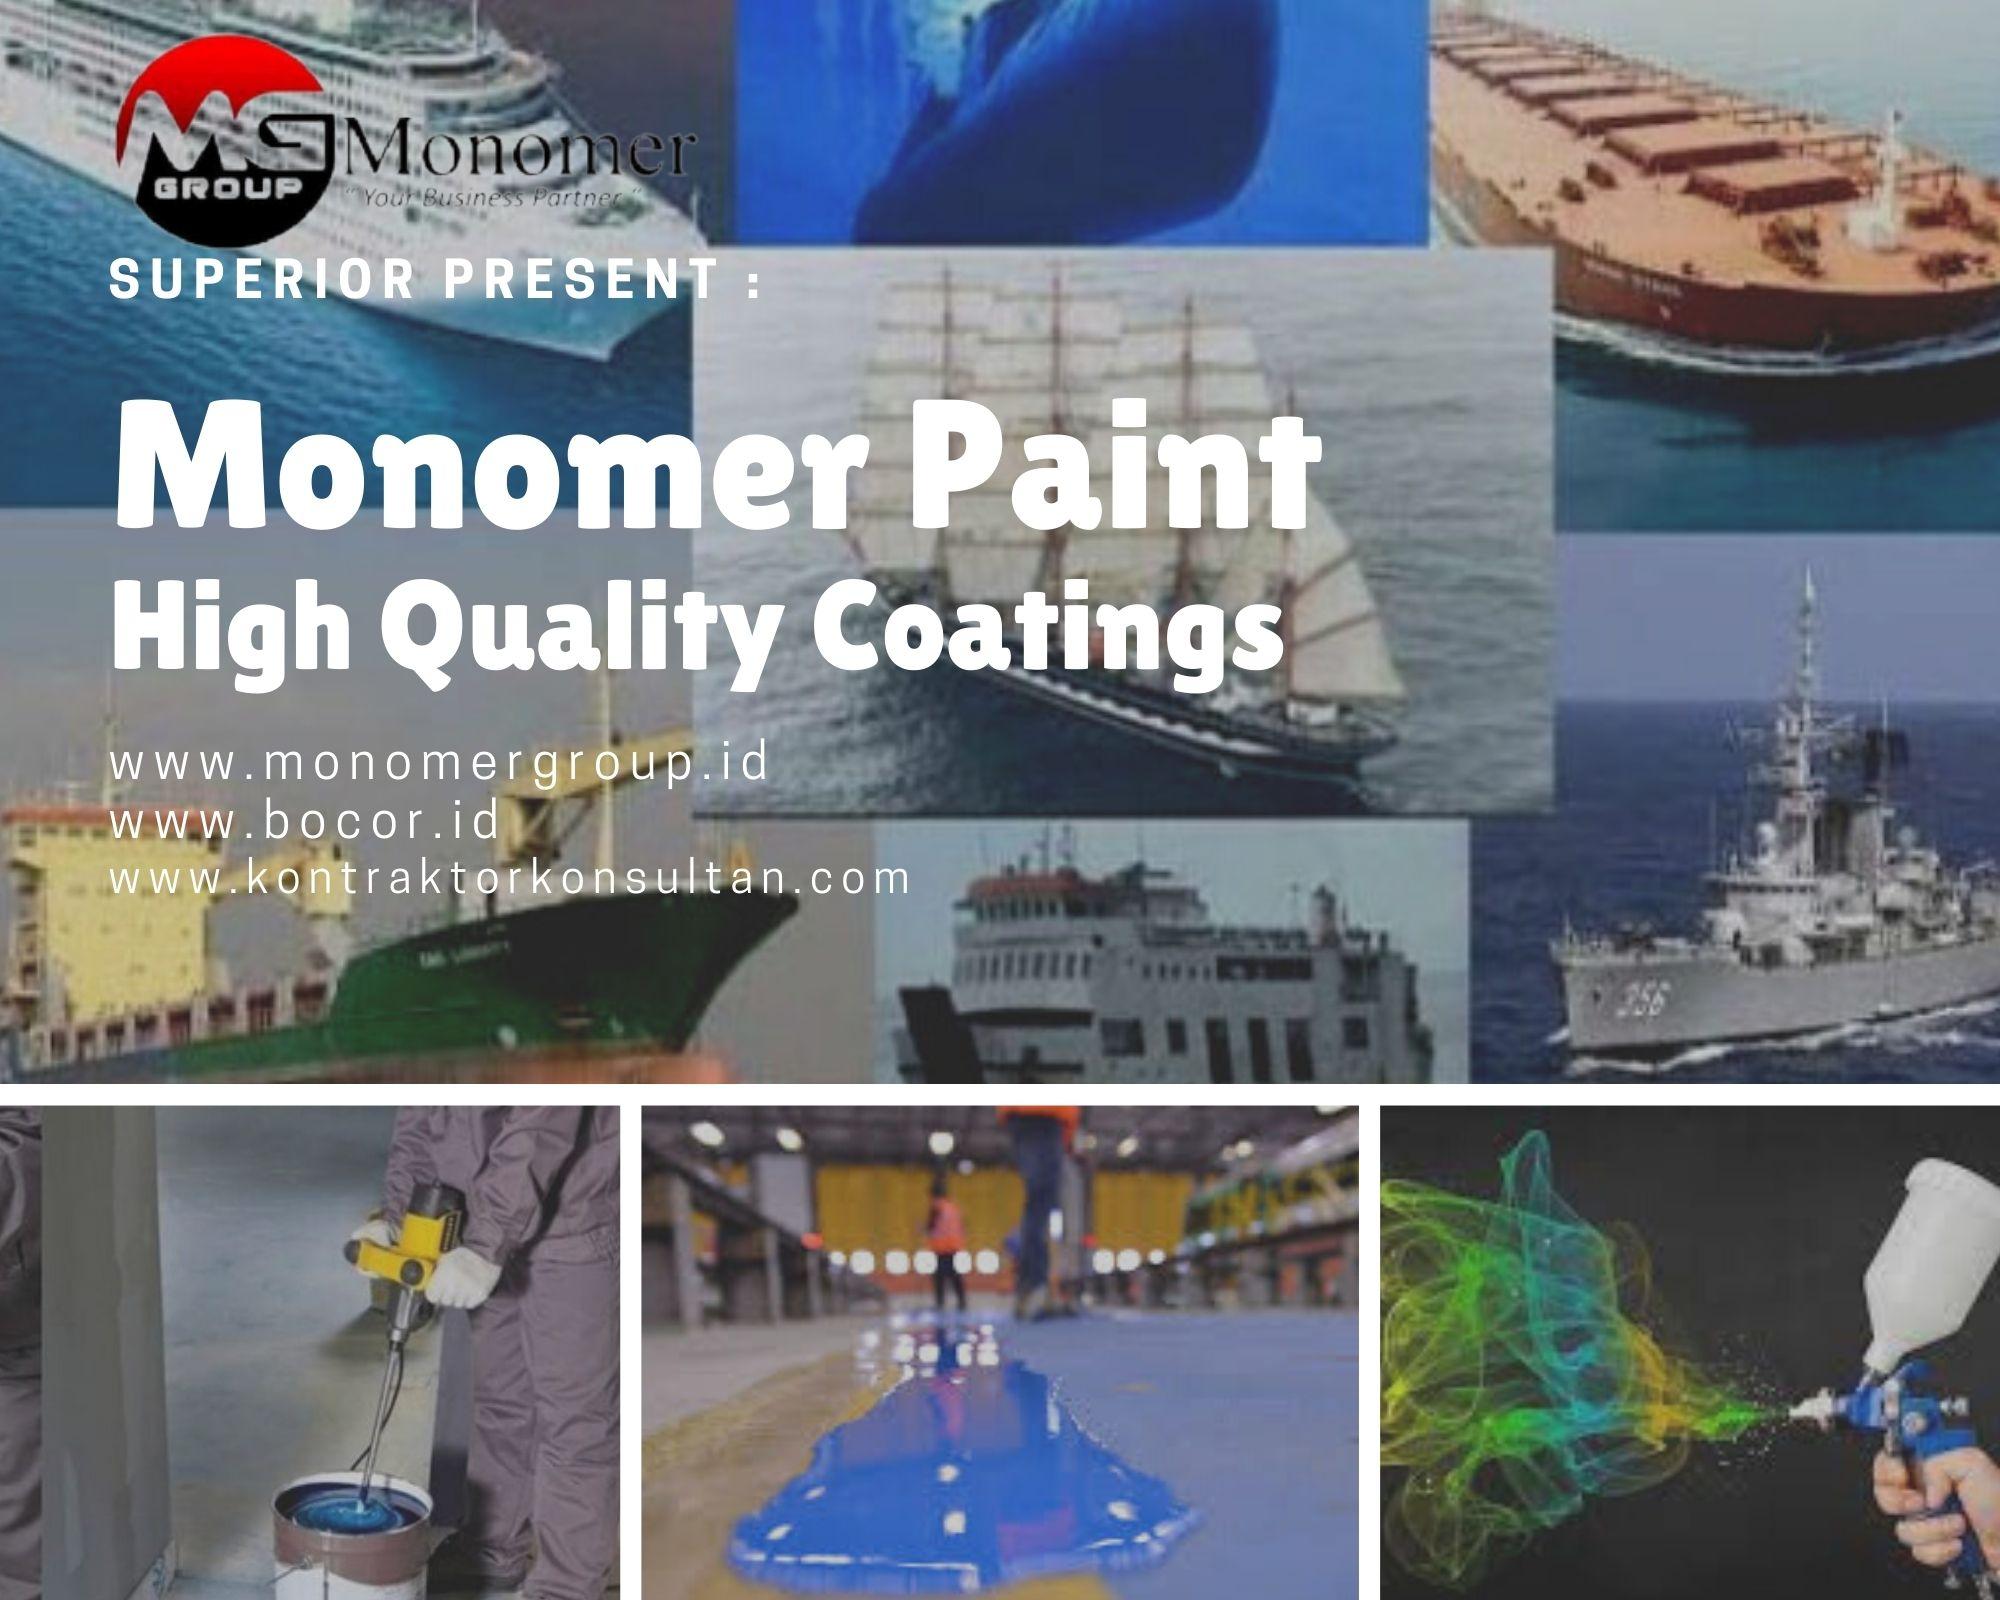 monomer paint